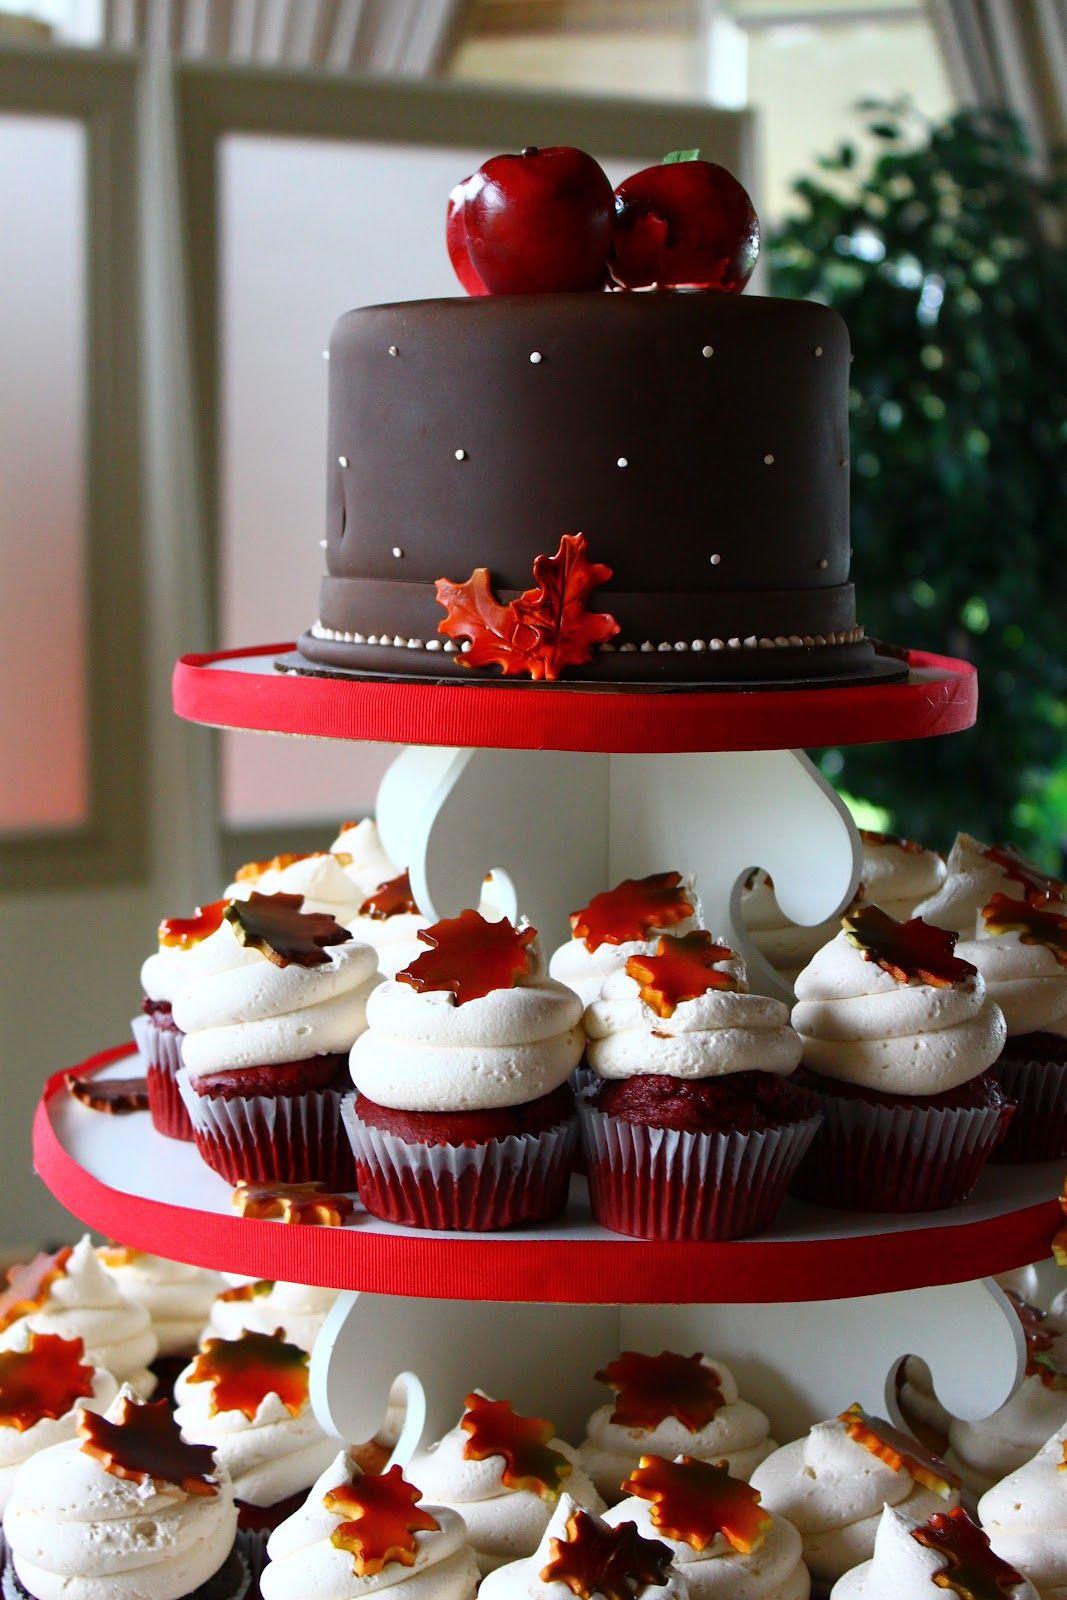 Happy Mahashivratri 2016 Online Birthday Cake Delivery Order Cake